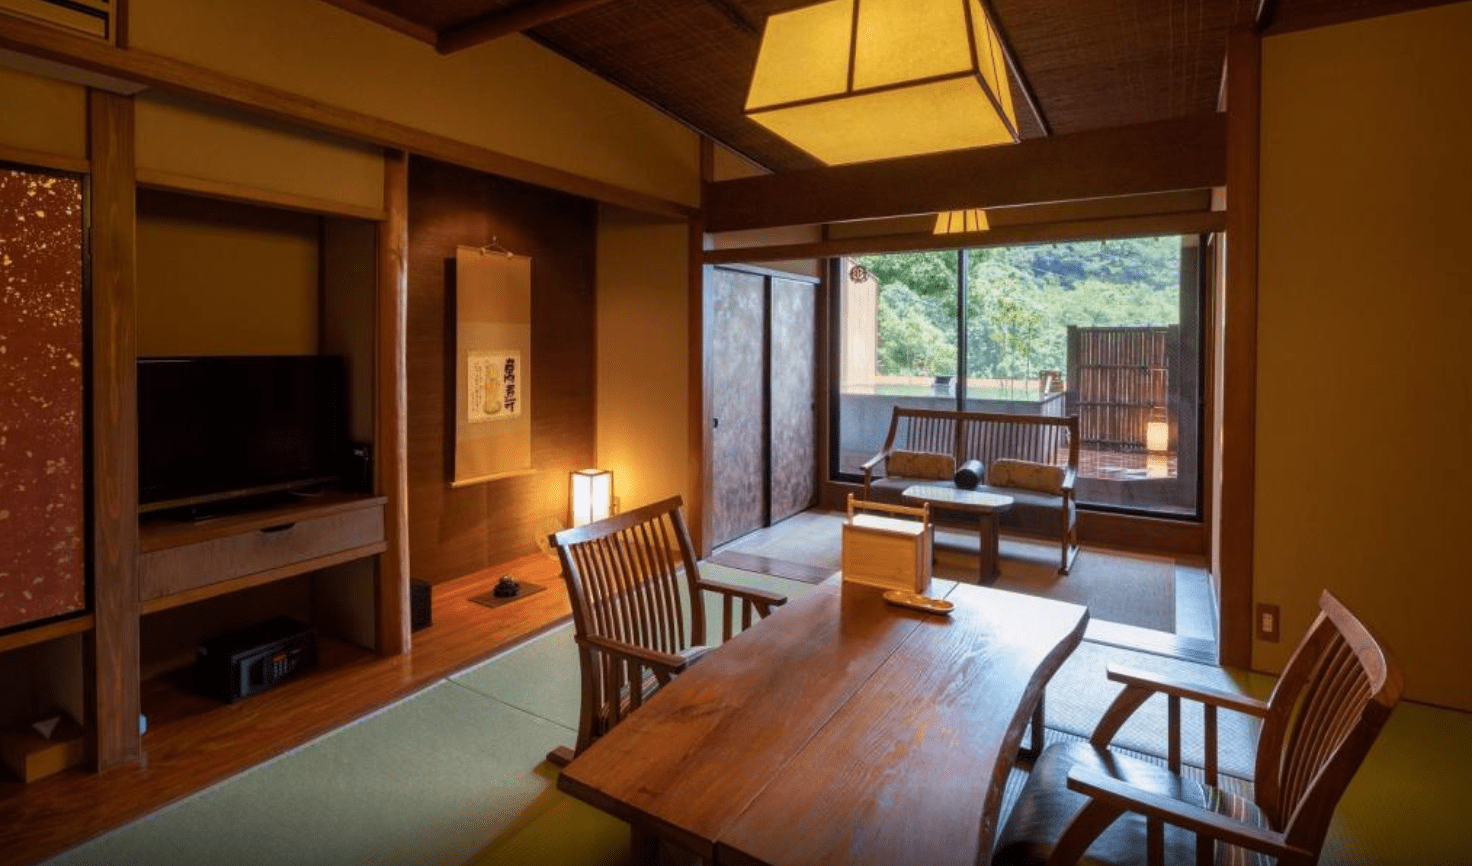 Watei Kazekomichi Hotel in Atami